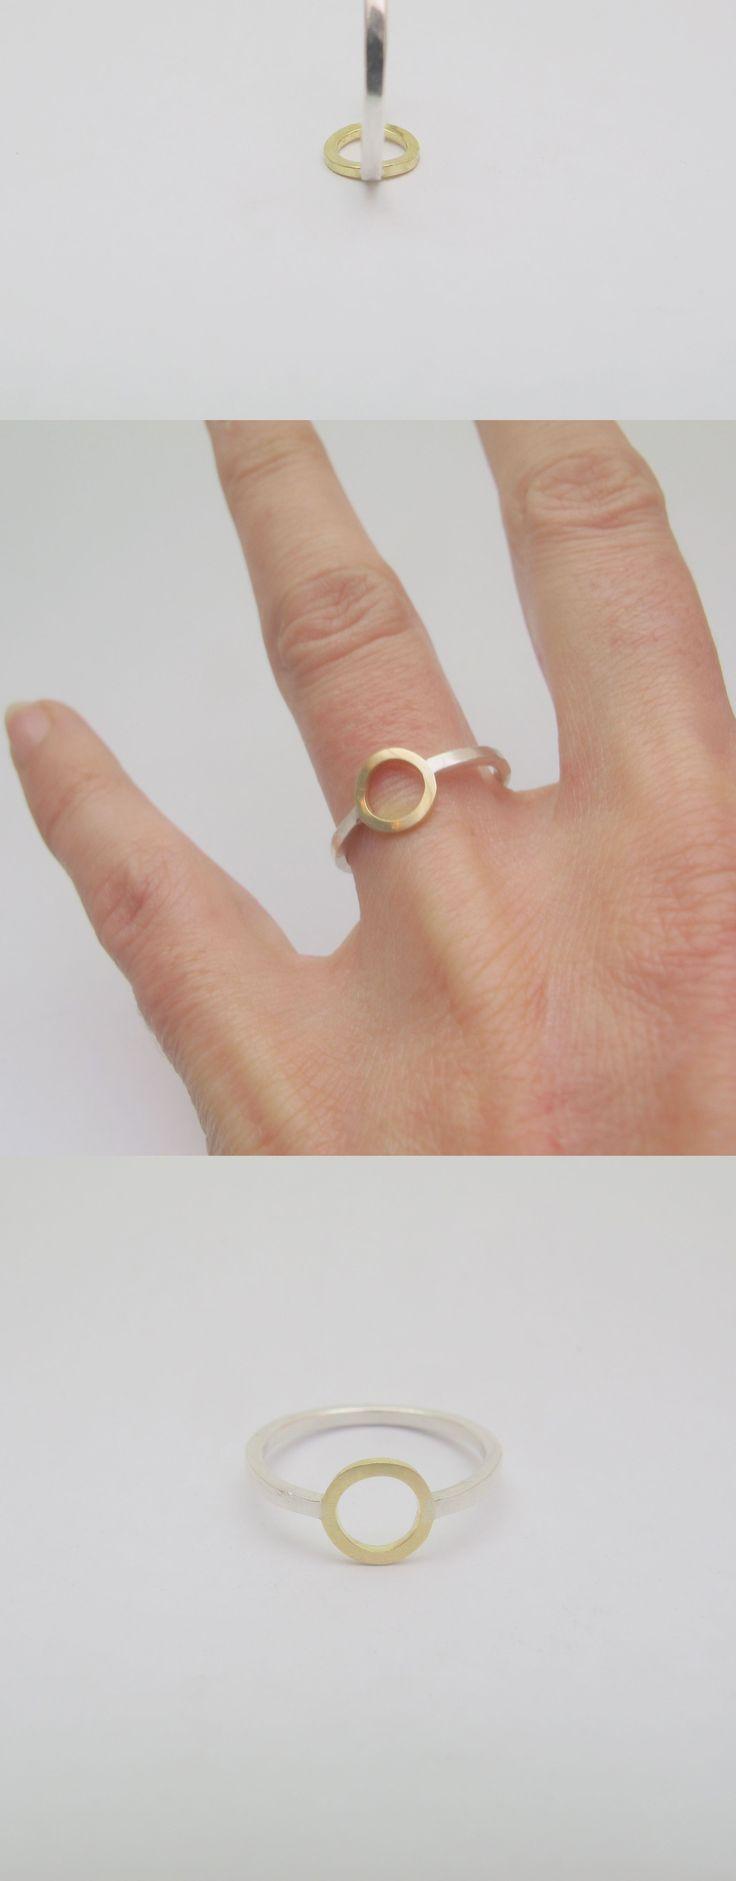 Ring-O-gold